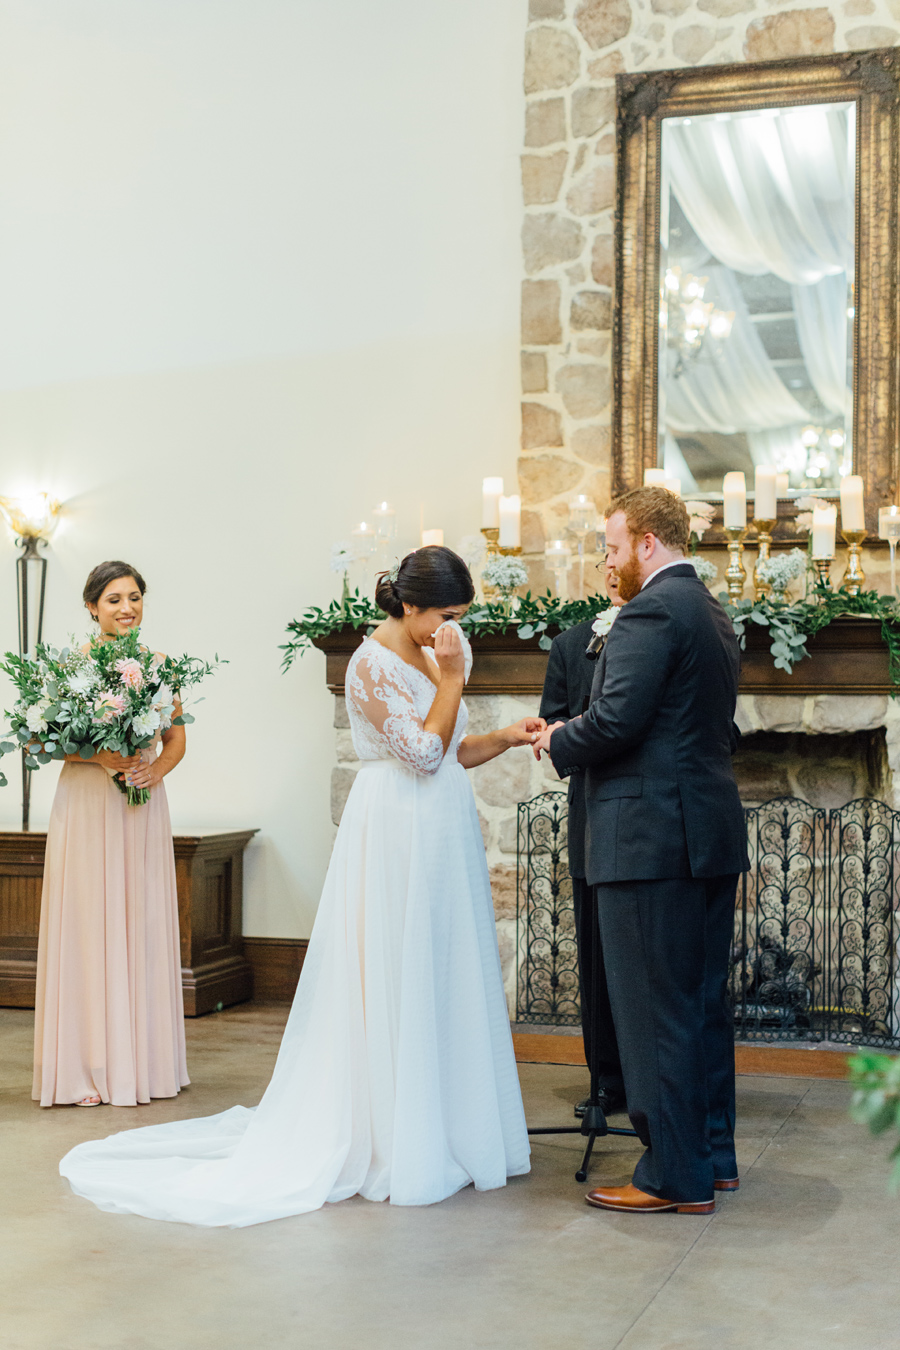 the-inn-at-leola-wedding-lancaster-pennsylvania-wedding-photographer-rebeka-viola-photograhy (60).jpg